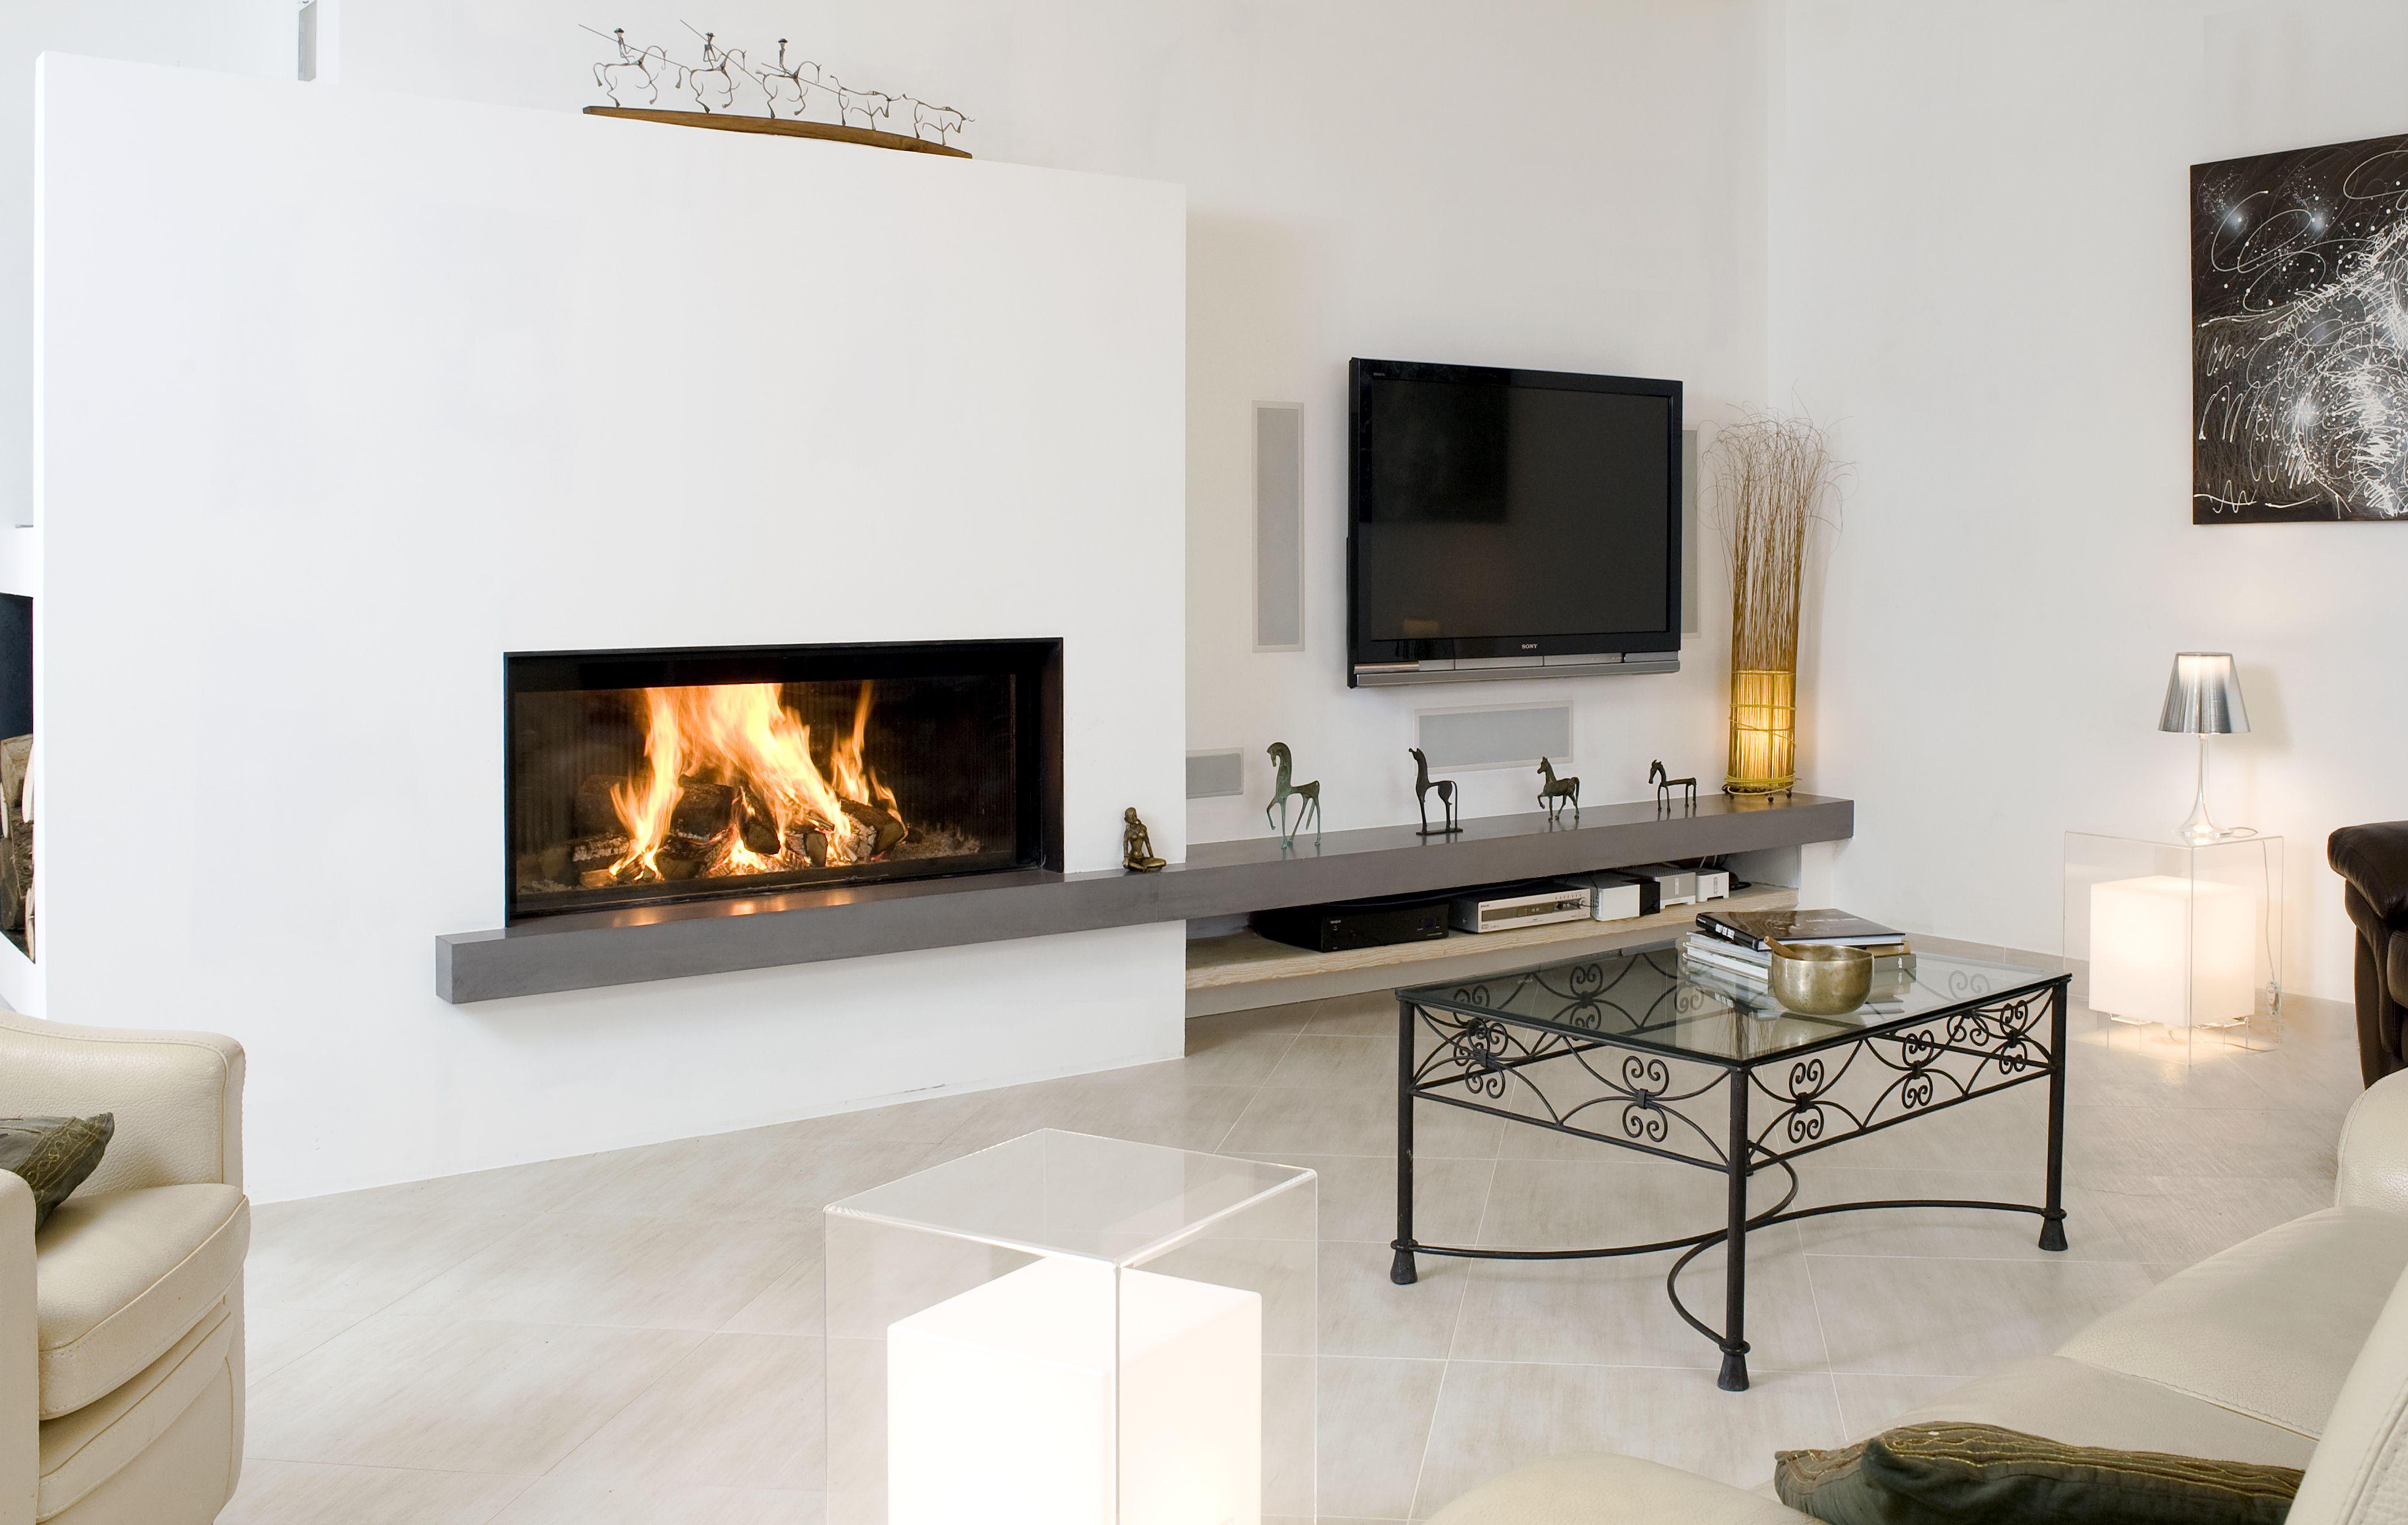 Metalfire 1300 50 tablette b ton cir cmg metalfire foyer bois pinterest - Beton cire pour cheminee ...